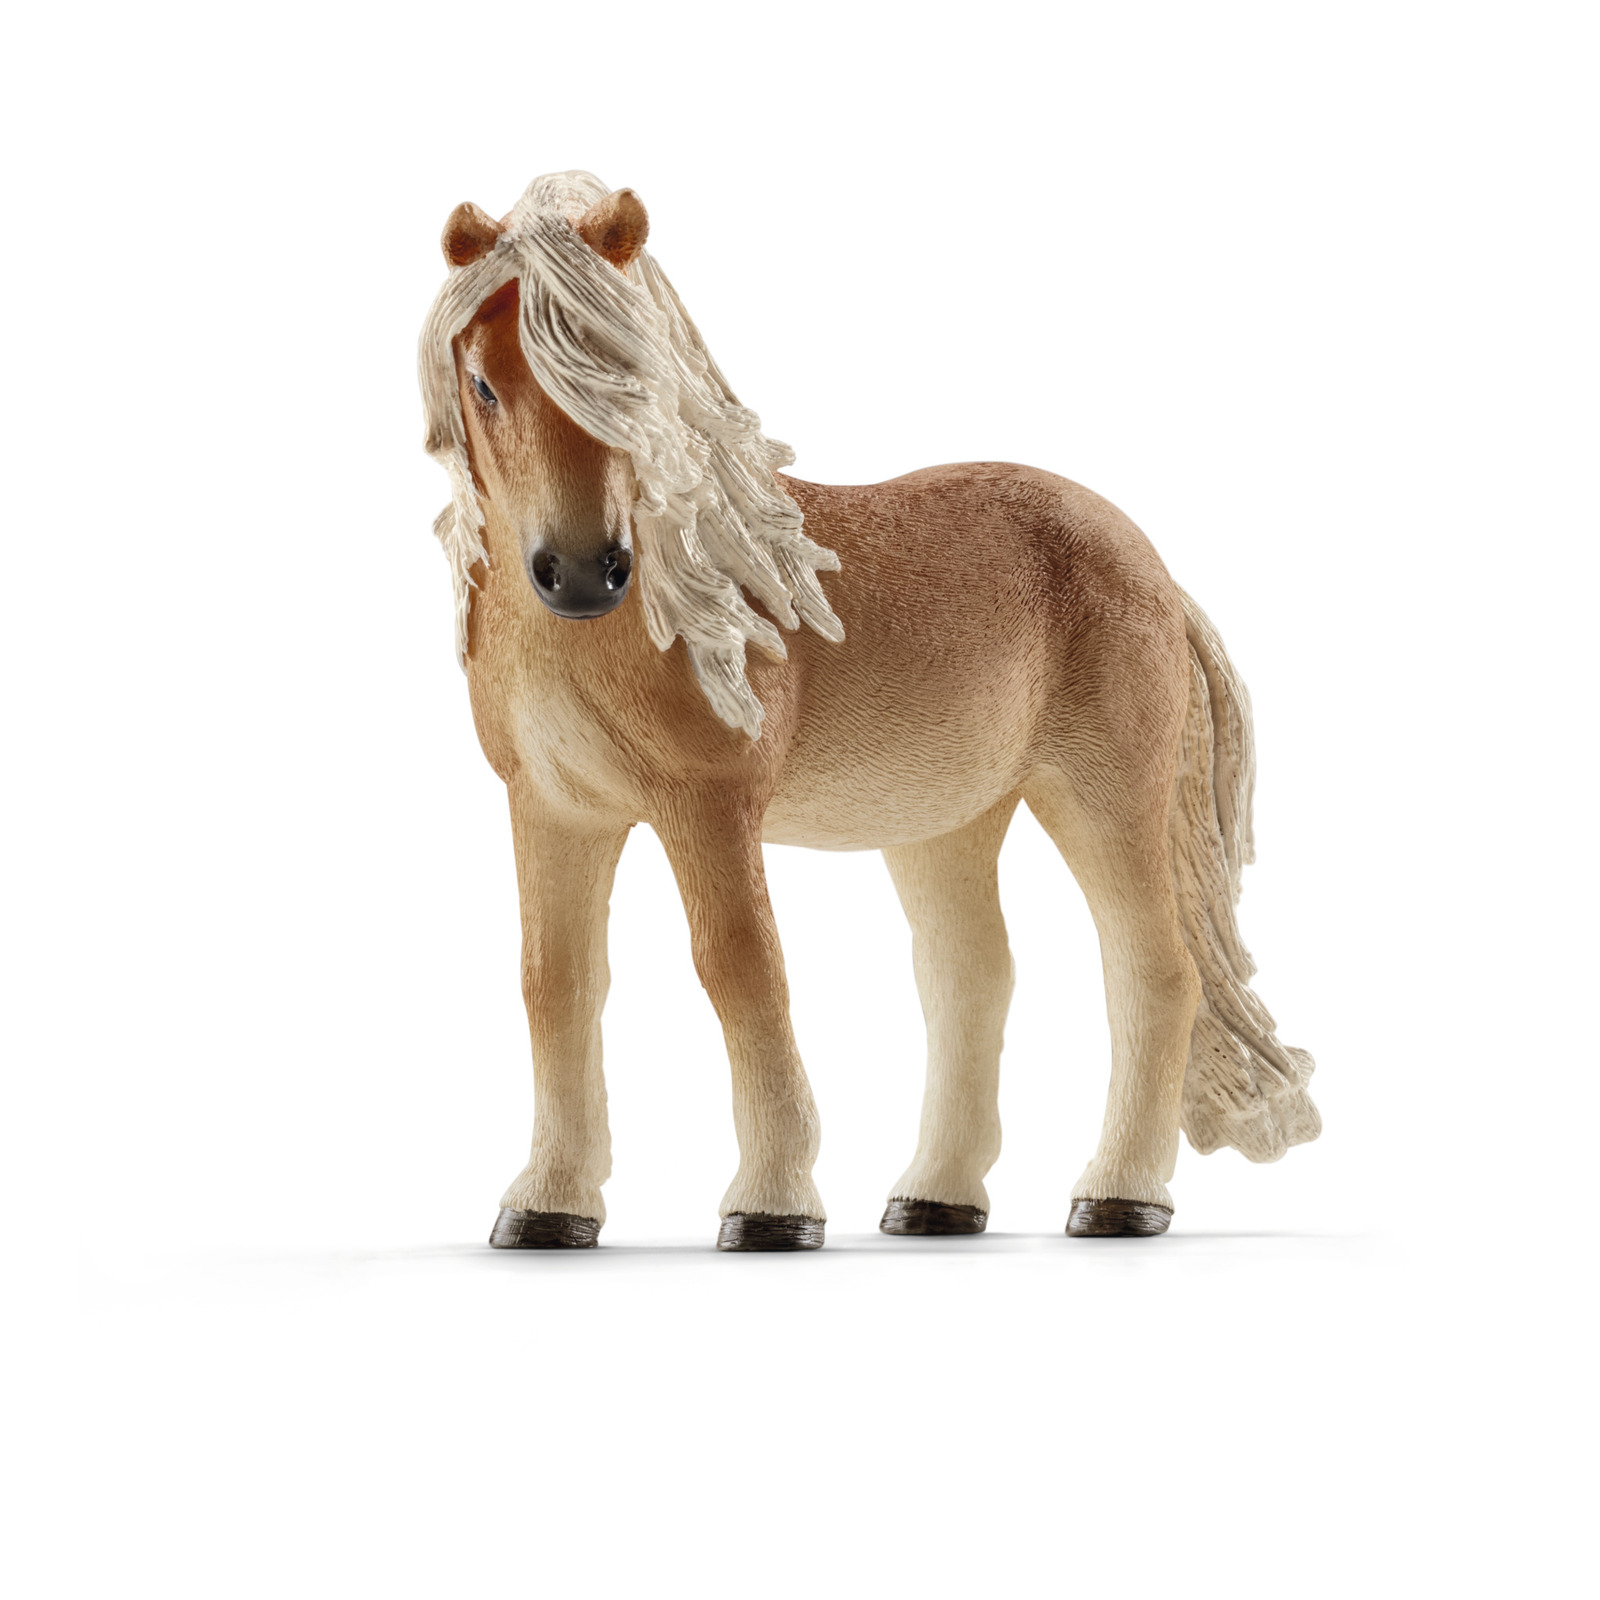 Schleich: Icelandic Pony Mare image